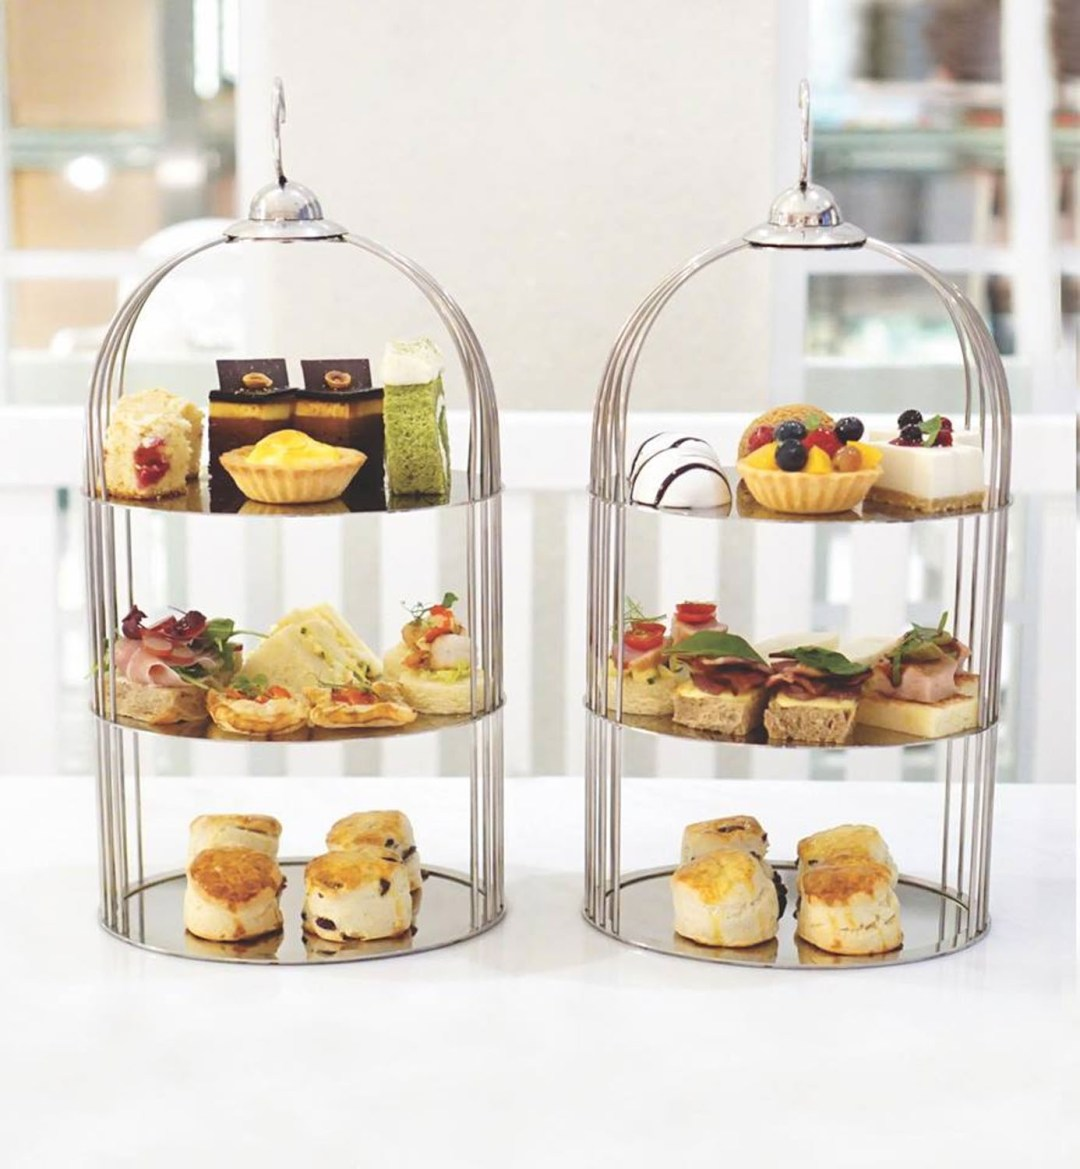 Affordable High Tea - d'Good Cafe